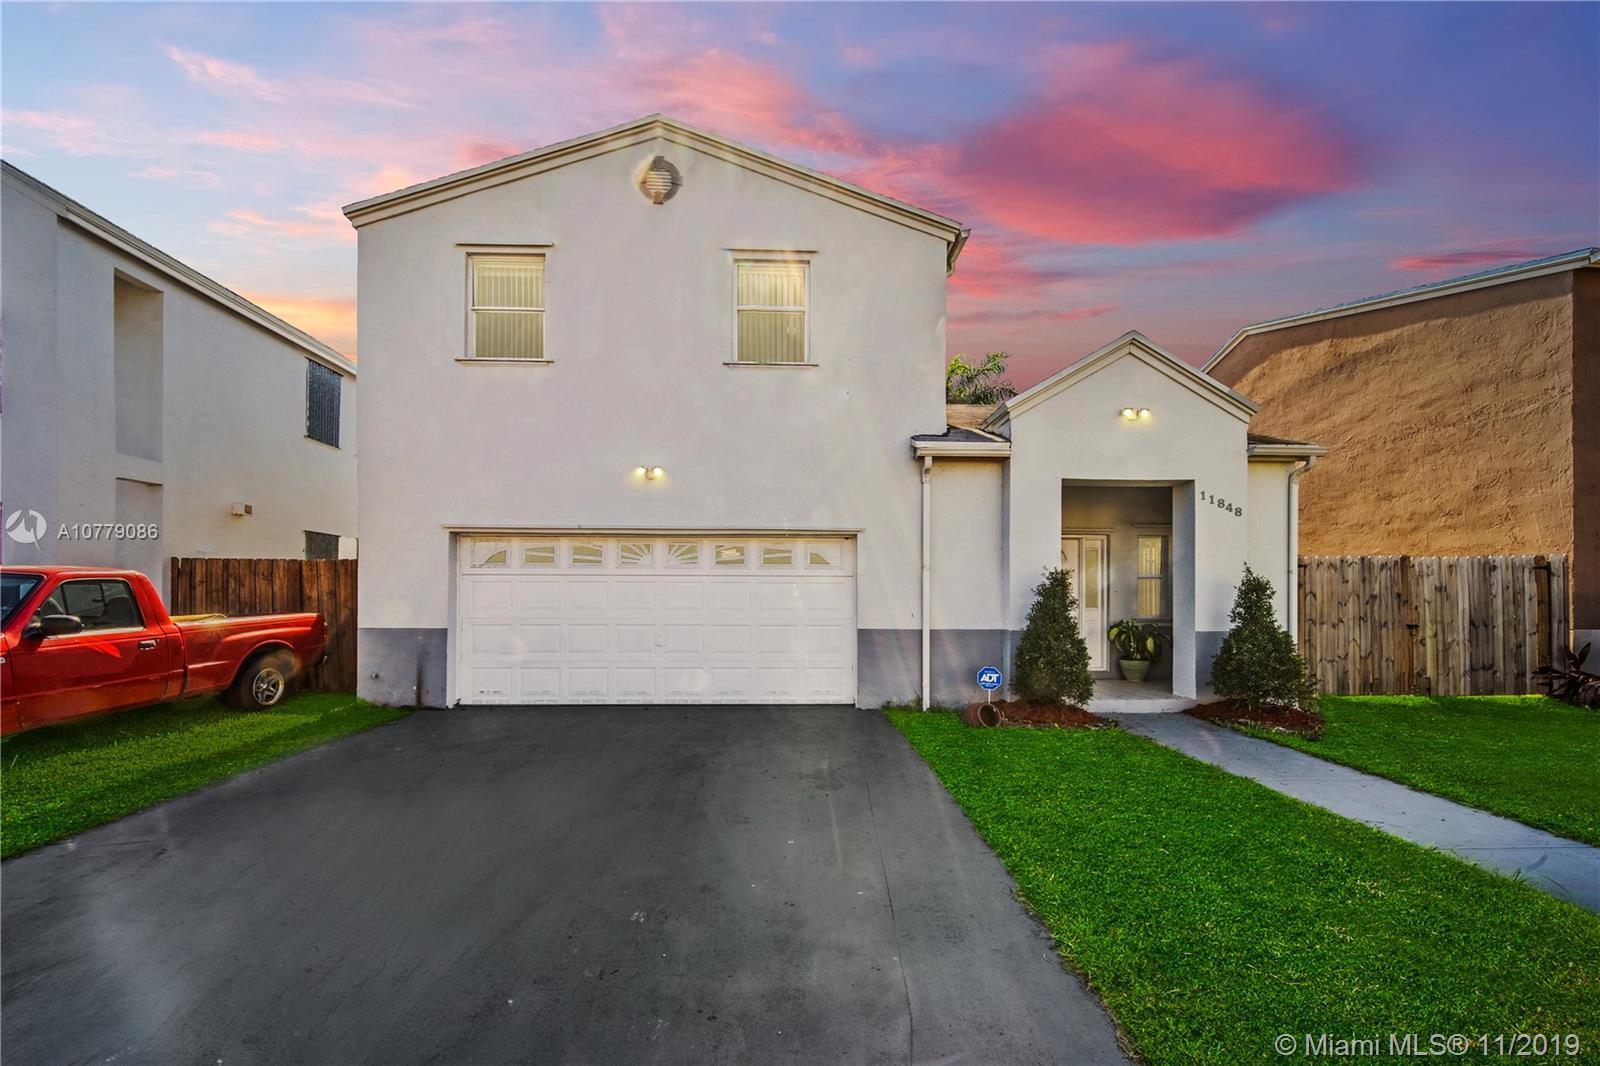 11848 SW 273 LN, Homestead, FL 33032 - Homestead, FL real estate listing